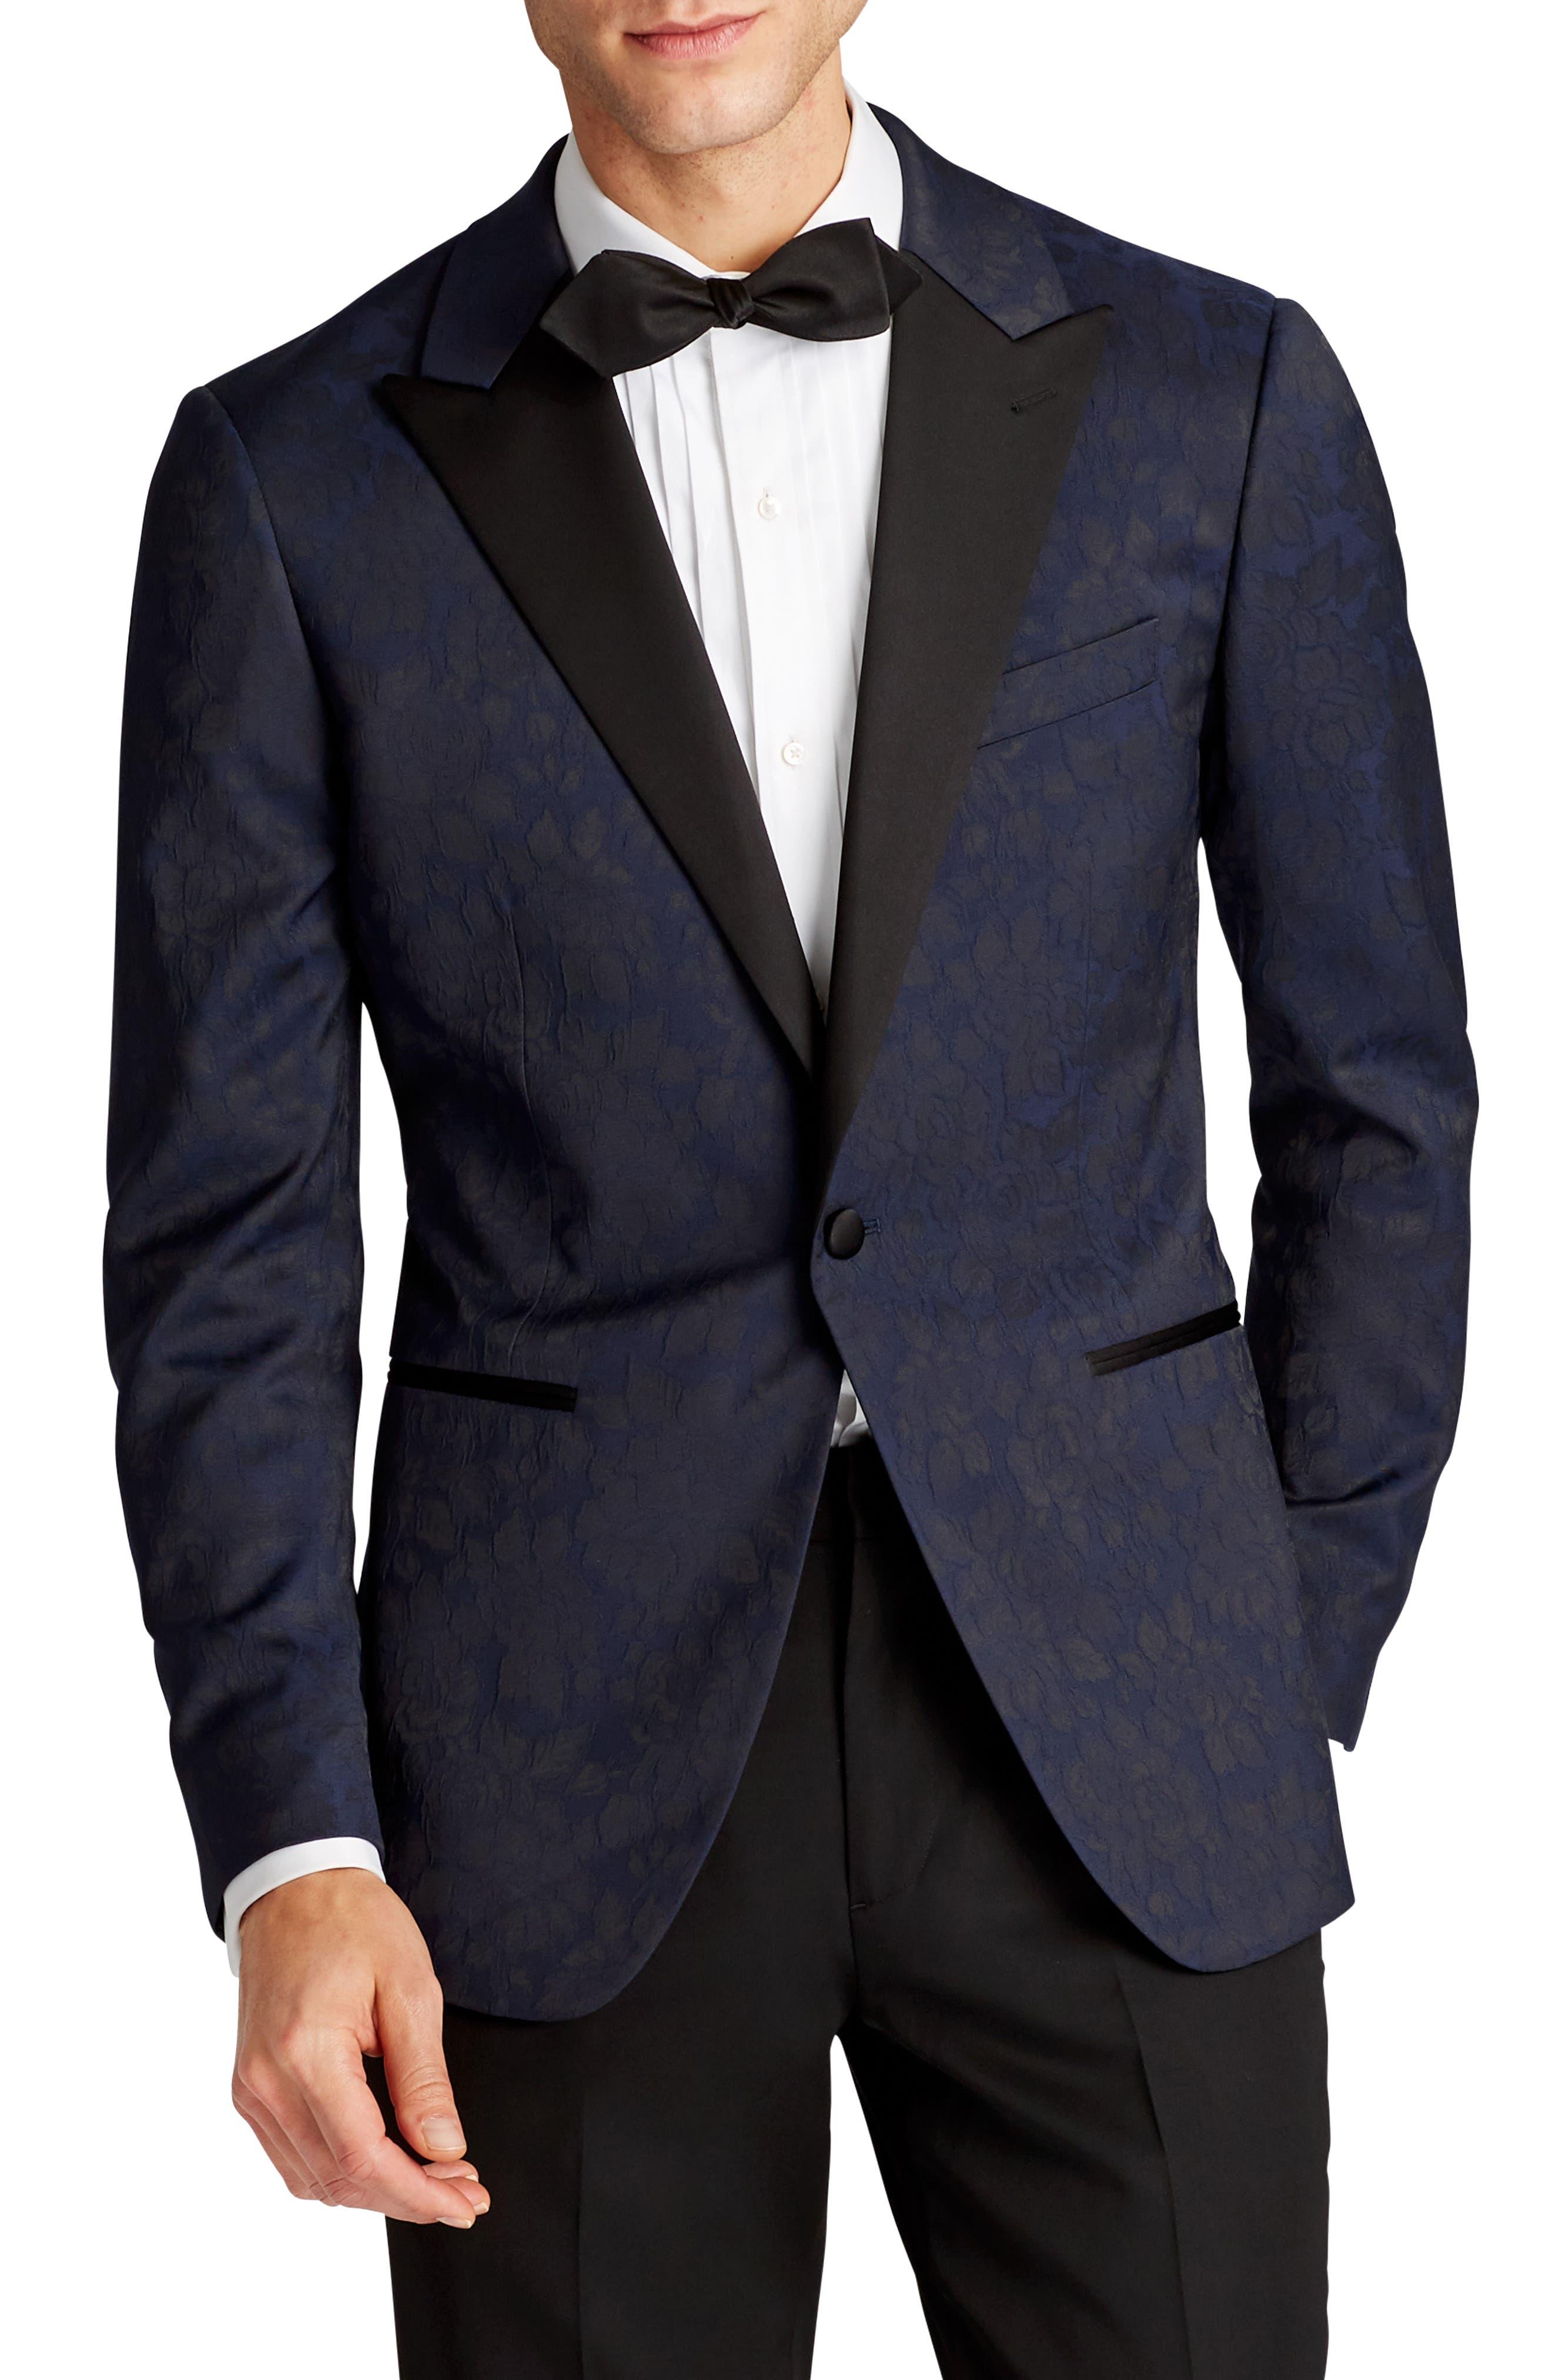 Men\'s Tuxedos: Wedding & Formal Wear | Nordstrom